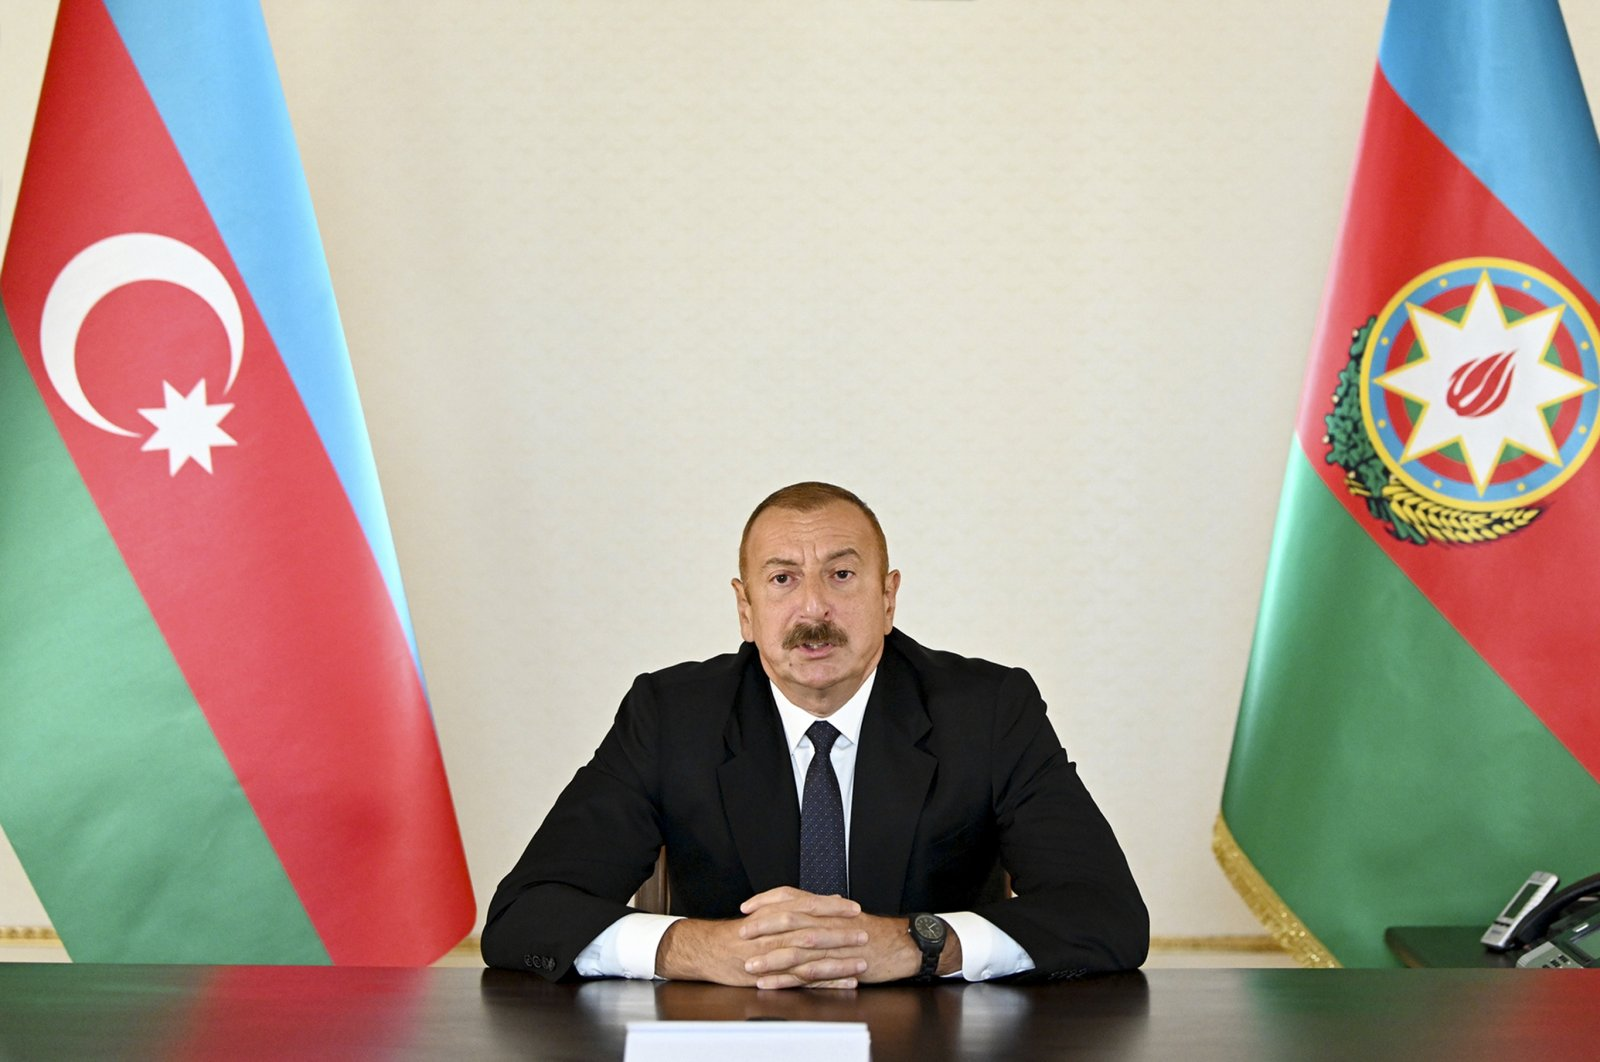 In this photo provided by Azerbaijan's Presidential Press Office, Azerbaijani President Ilham Aliyev addresses the nation in Baku, Azerbaijan, Sept. 27, 2020. (AP File Photo)